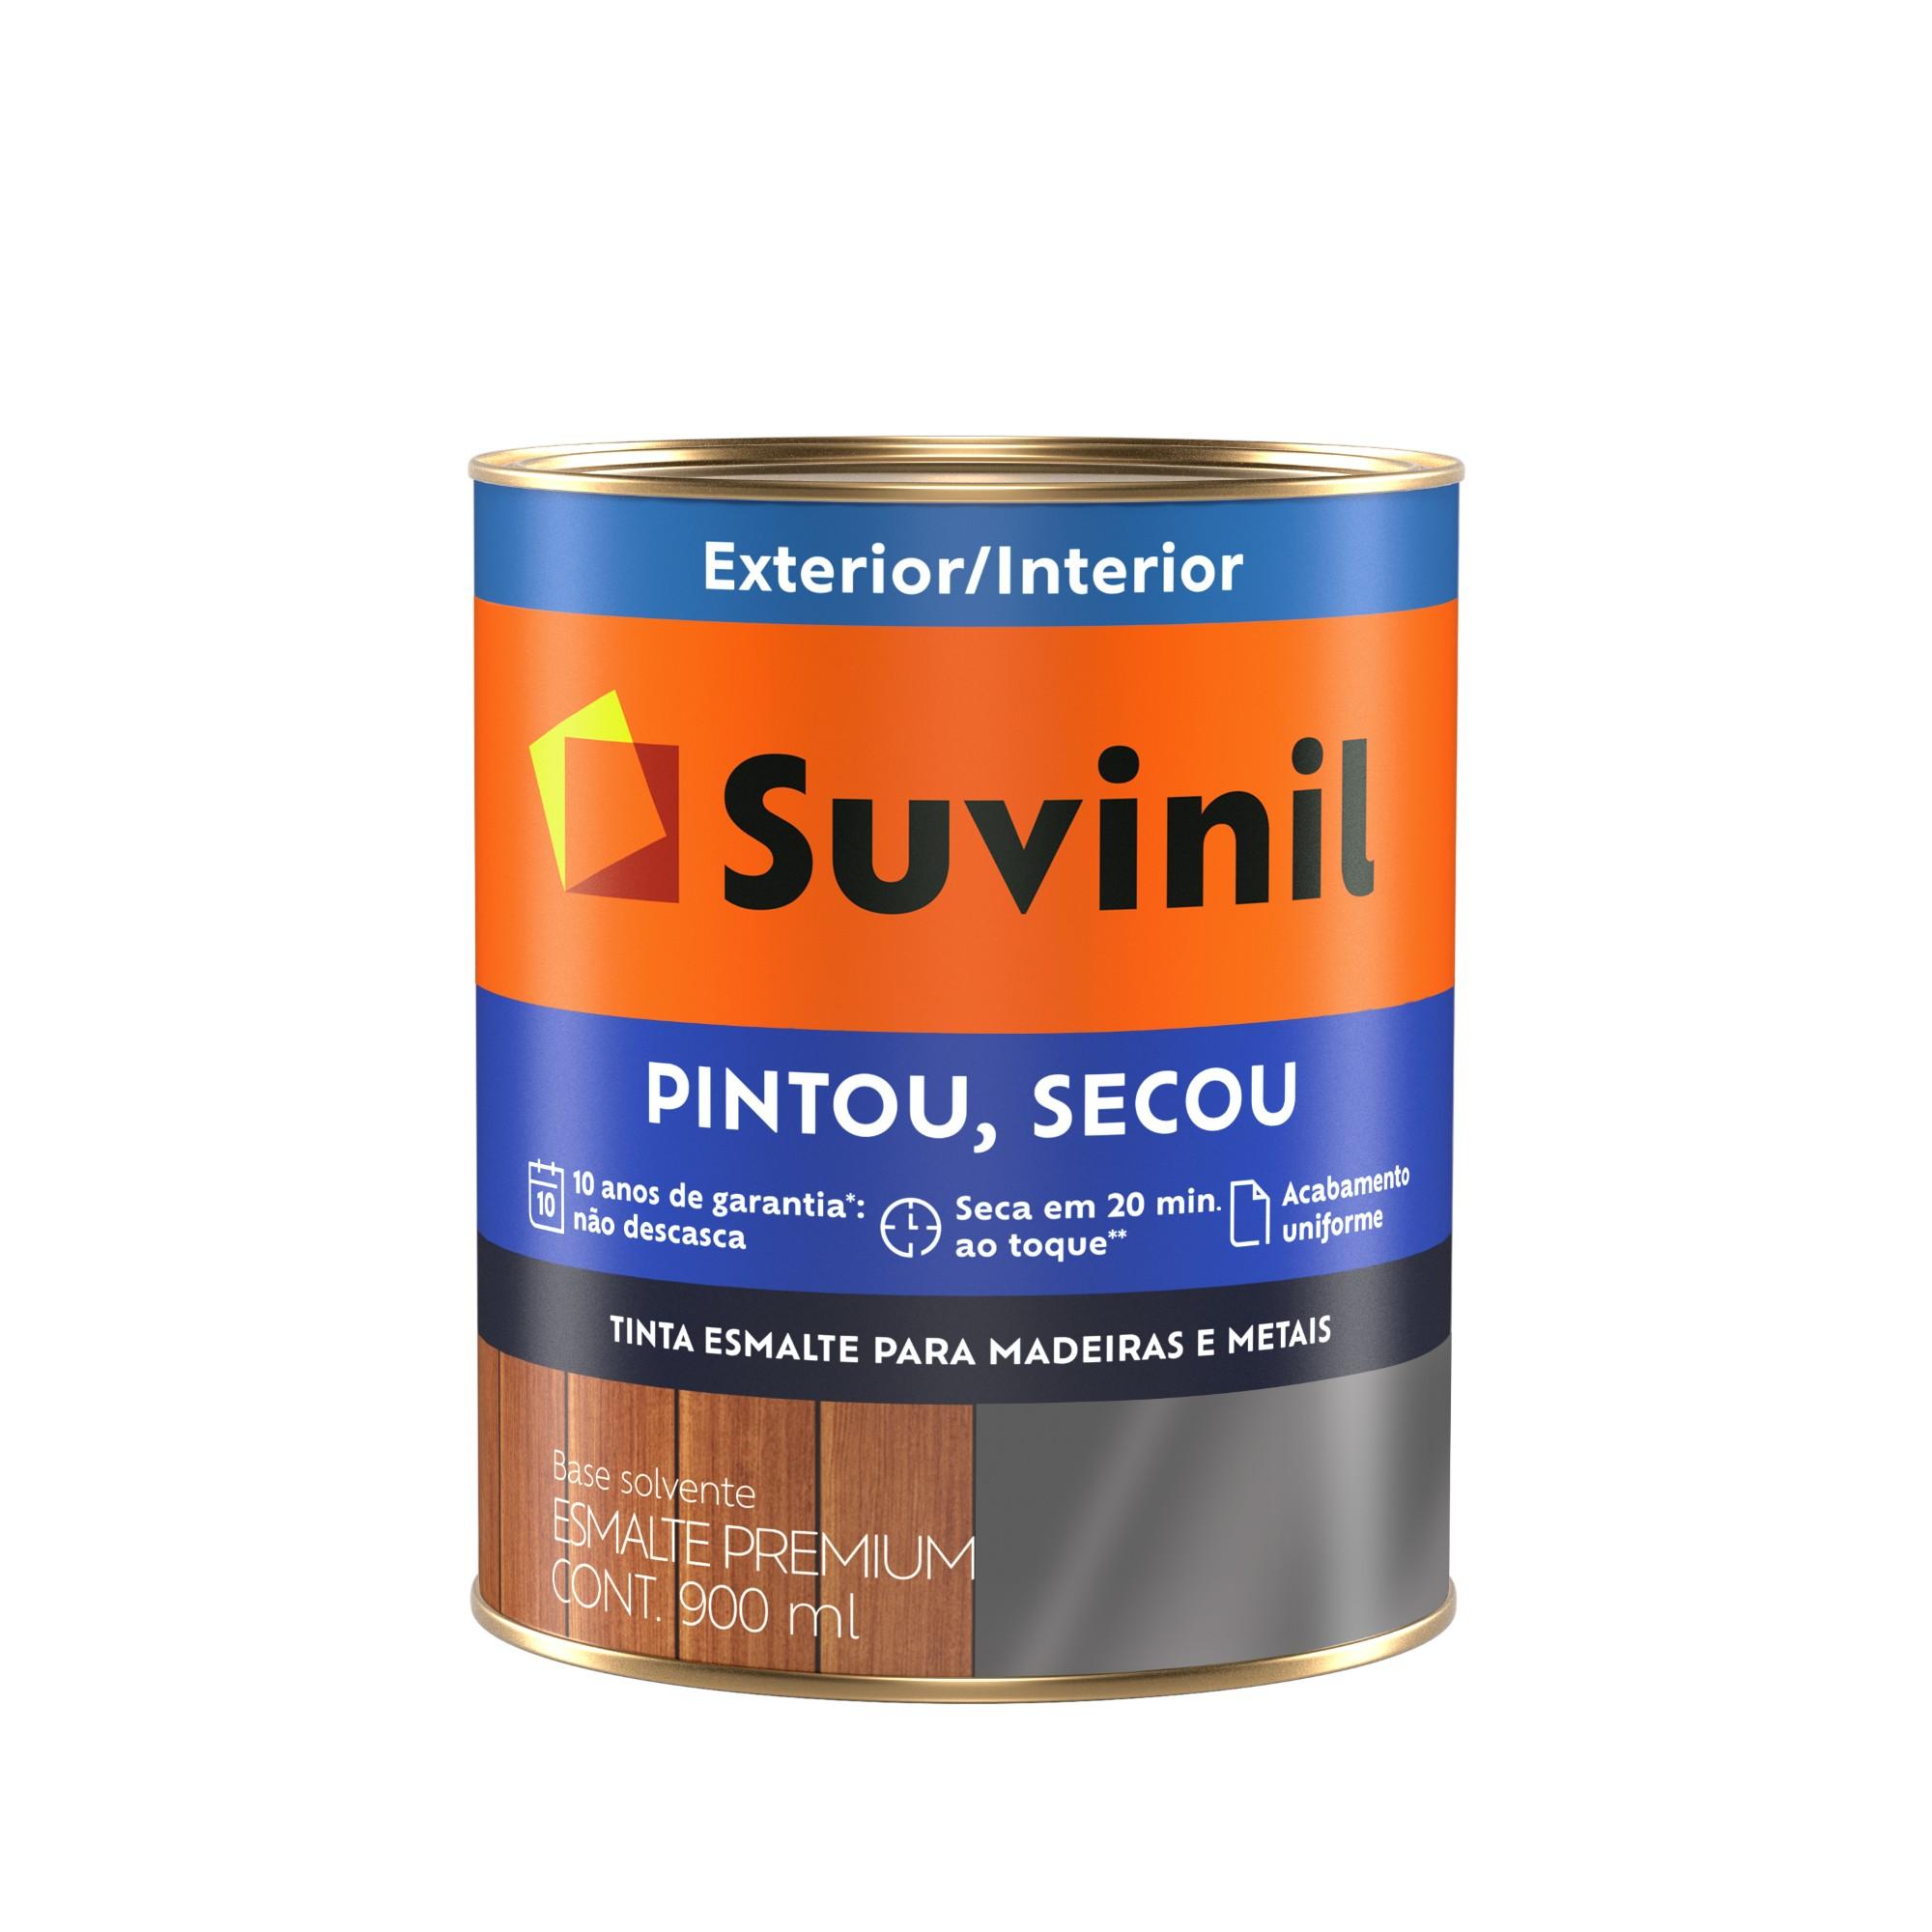 Tinta Esmalte Sintetico Brilhante Premium 09L - Vermelho - Pintou Secou Suvinil